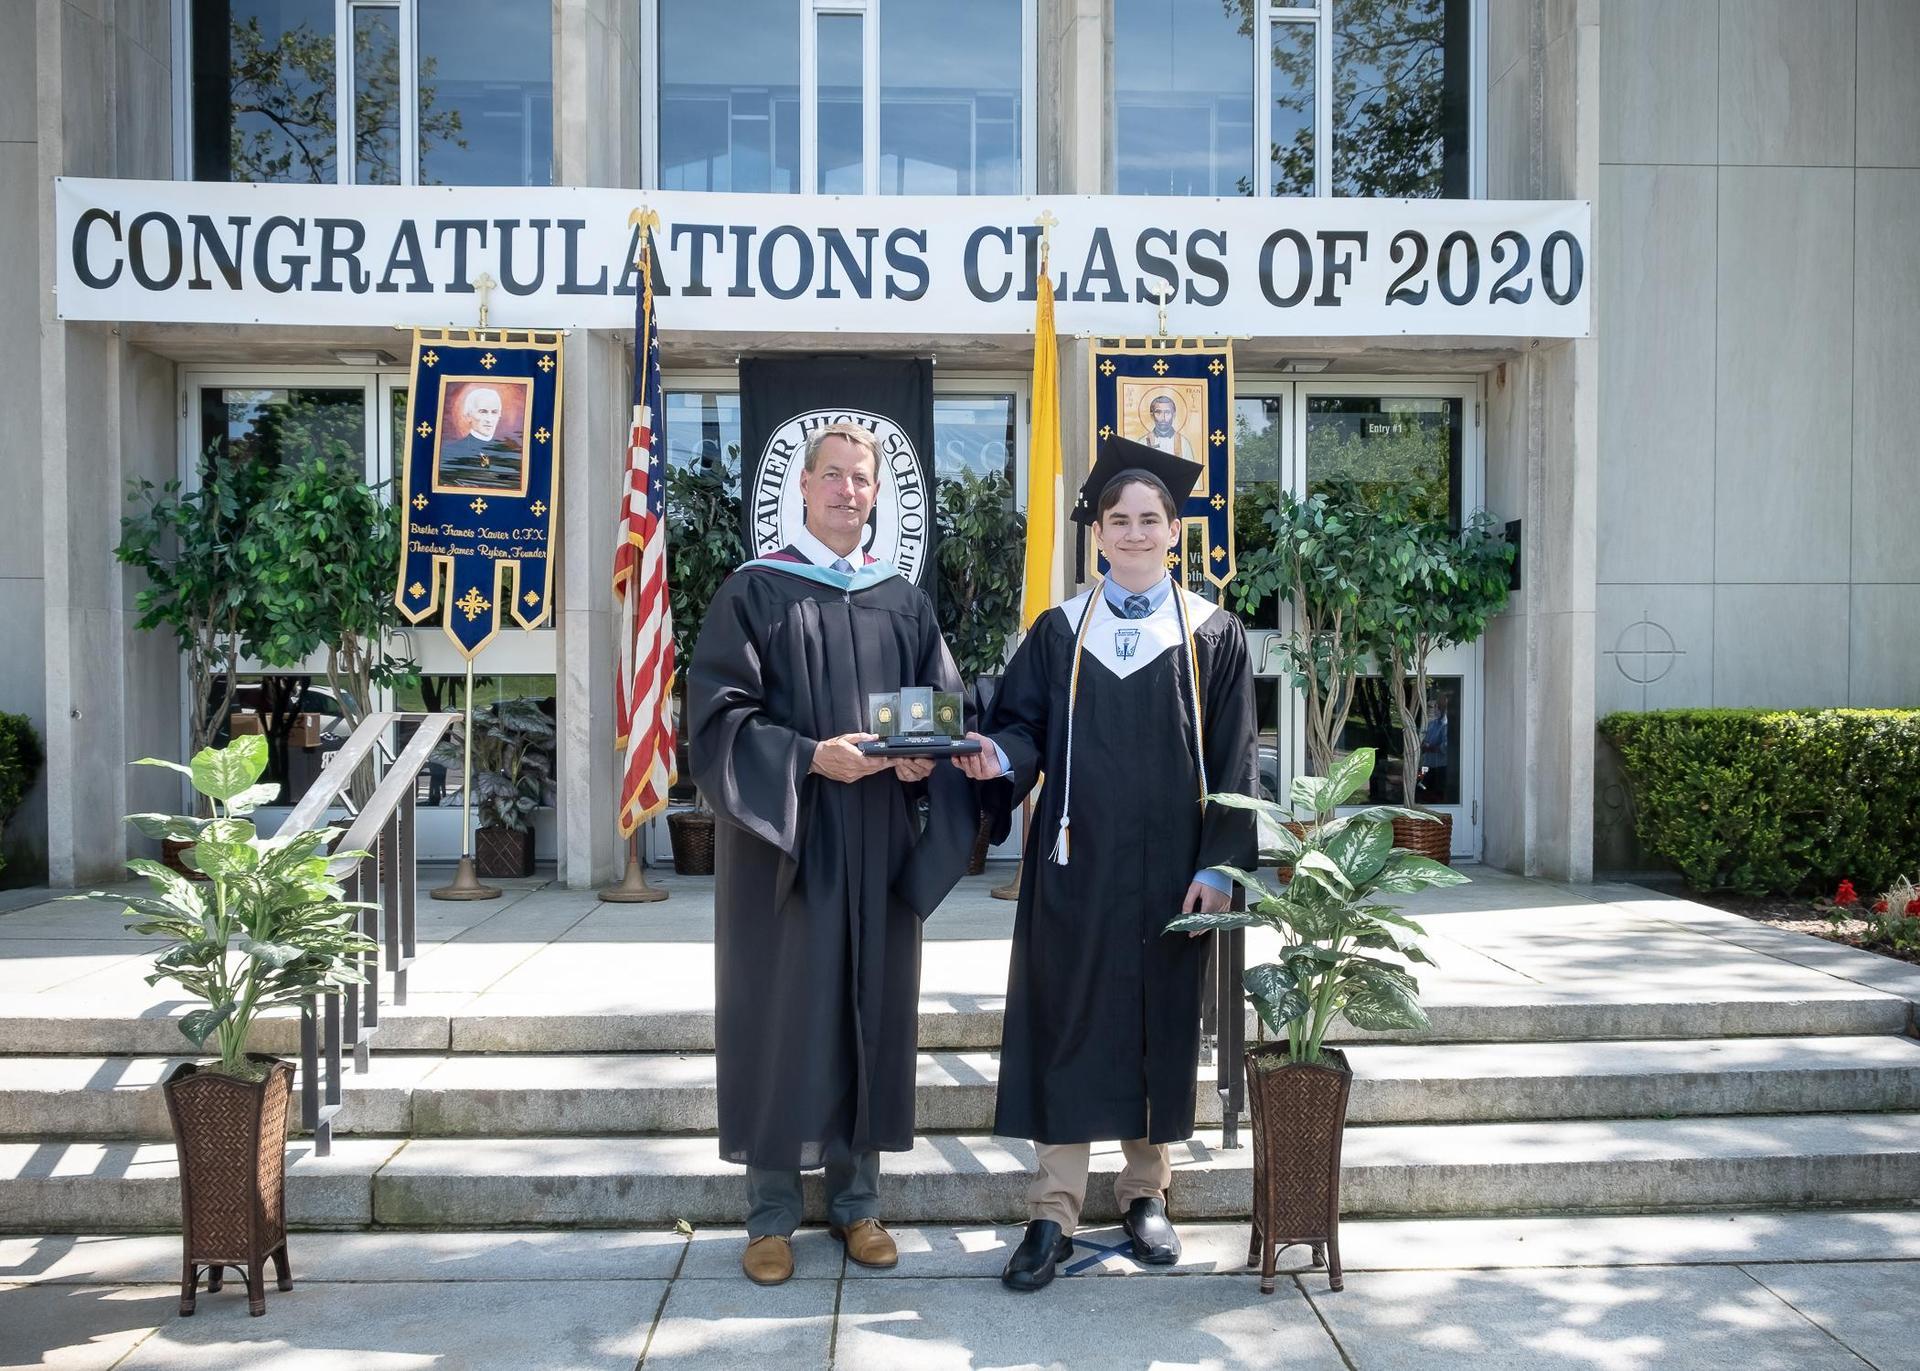 2020 valedictorian Alex Pralea